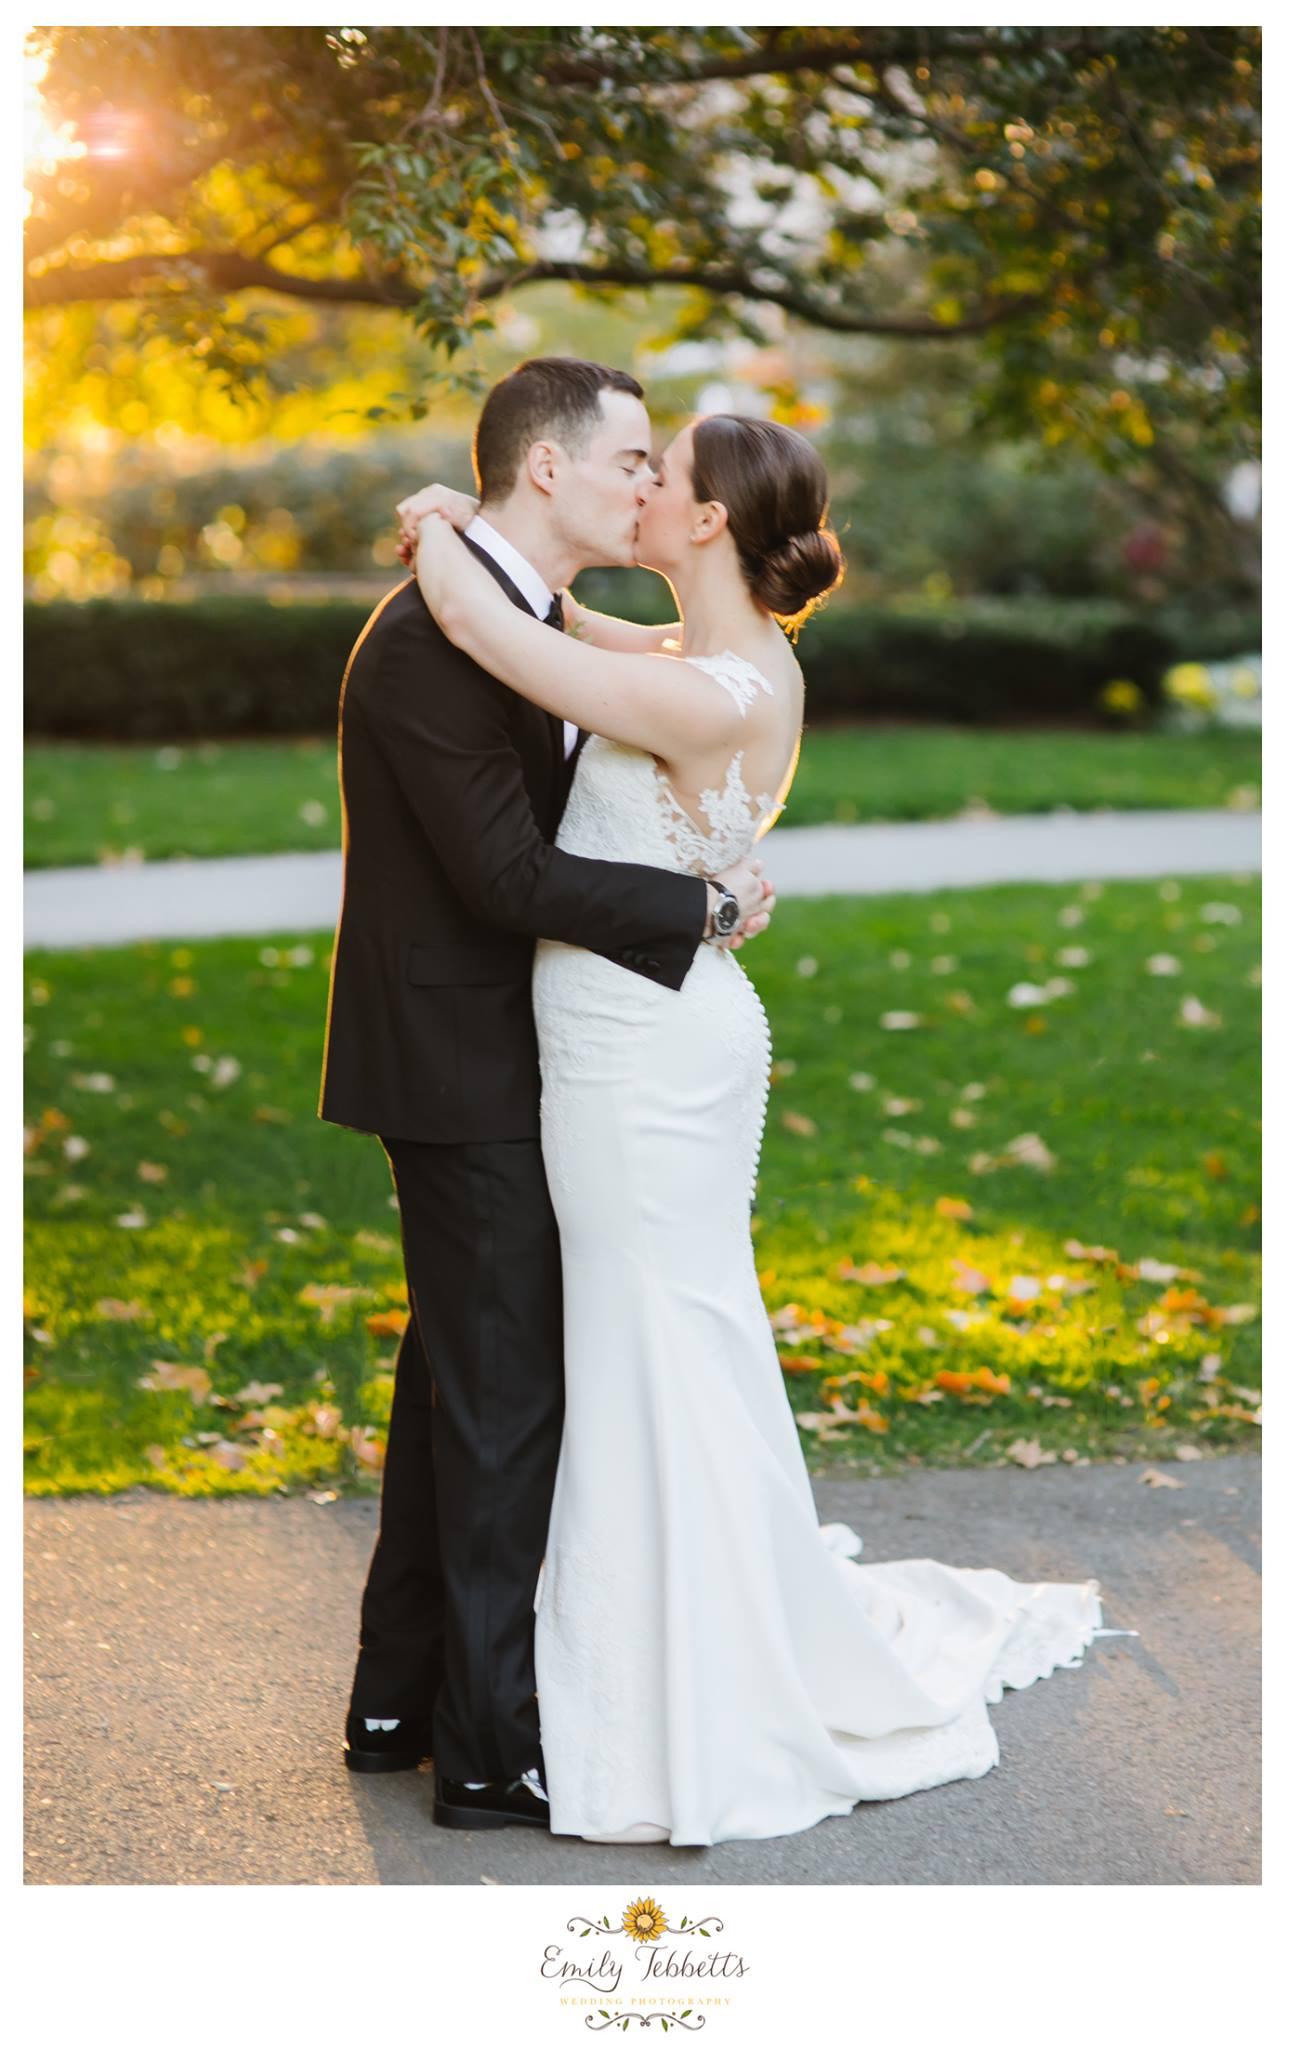 Boston, MA - Emily Tebbetts Wedding Photography 10.jpg